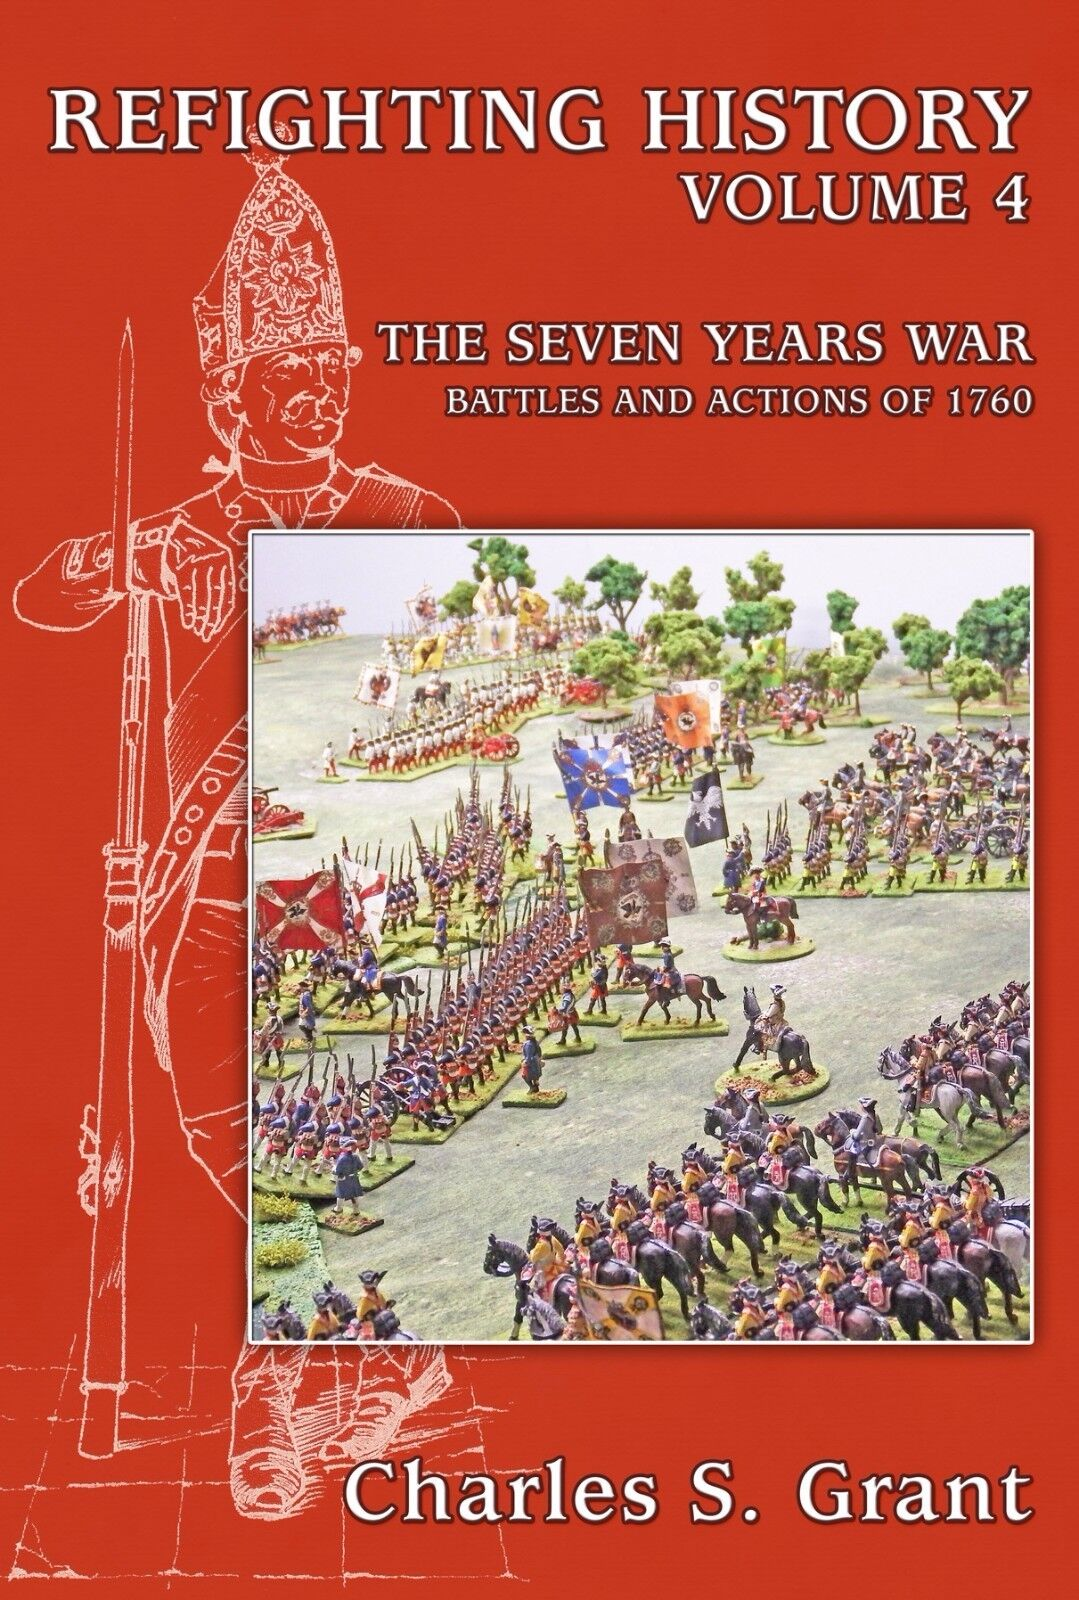 REFIGHTING HISTORY - VOLUME 4 THE SEVEN YEARS WAR  - PARTIZAN PRESS